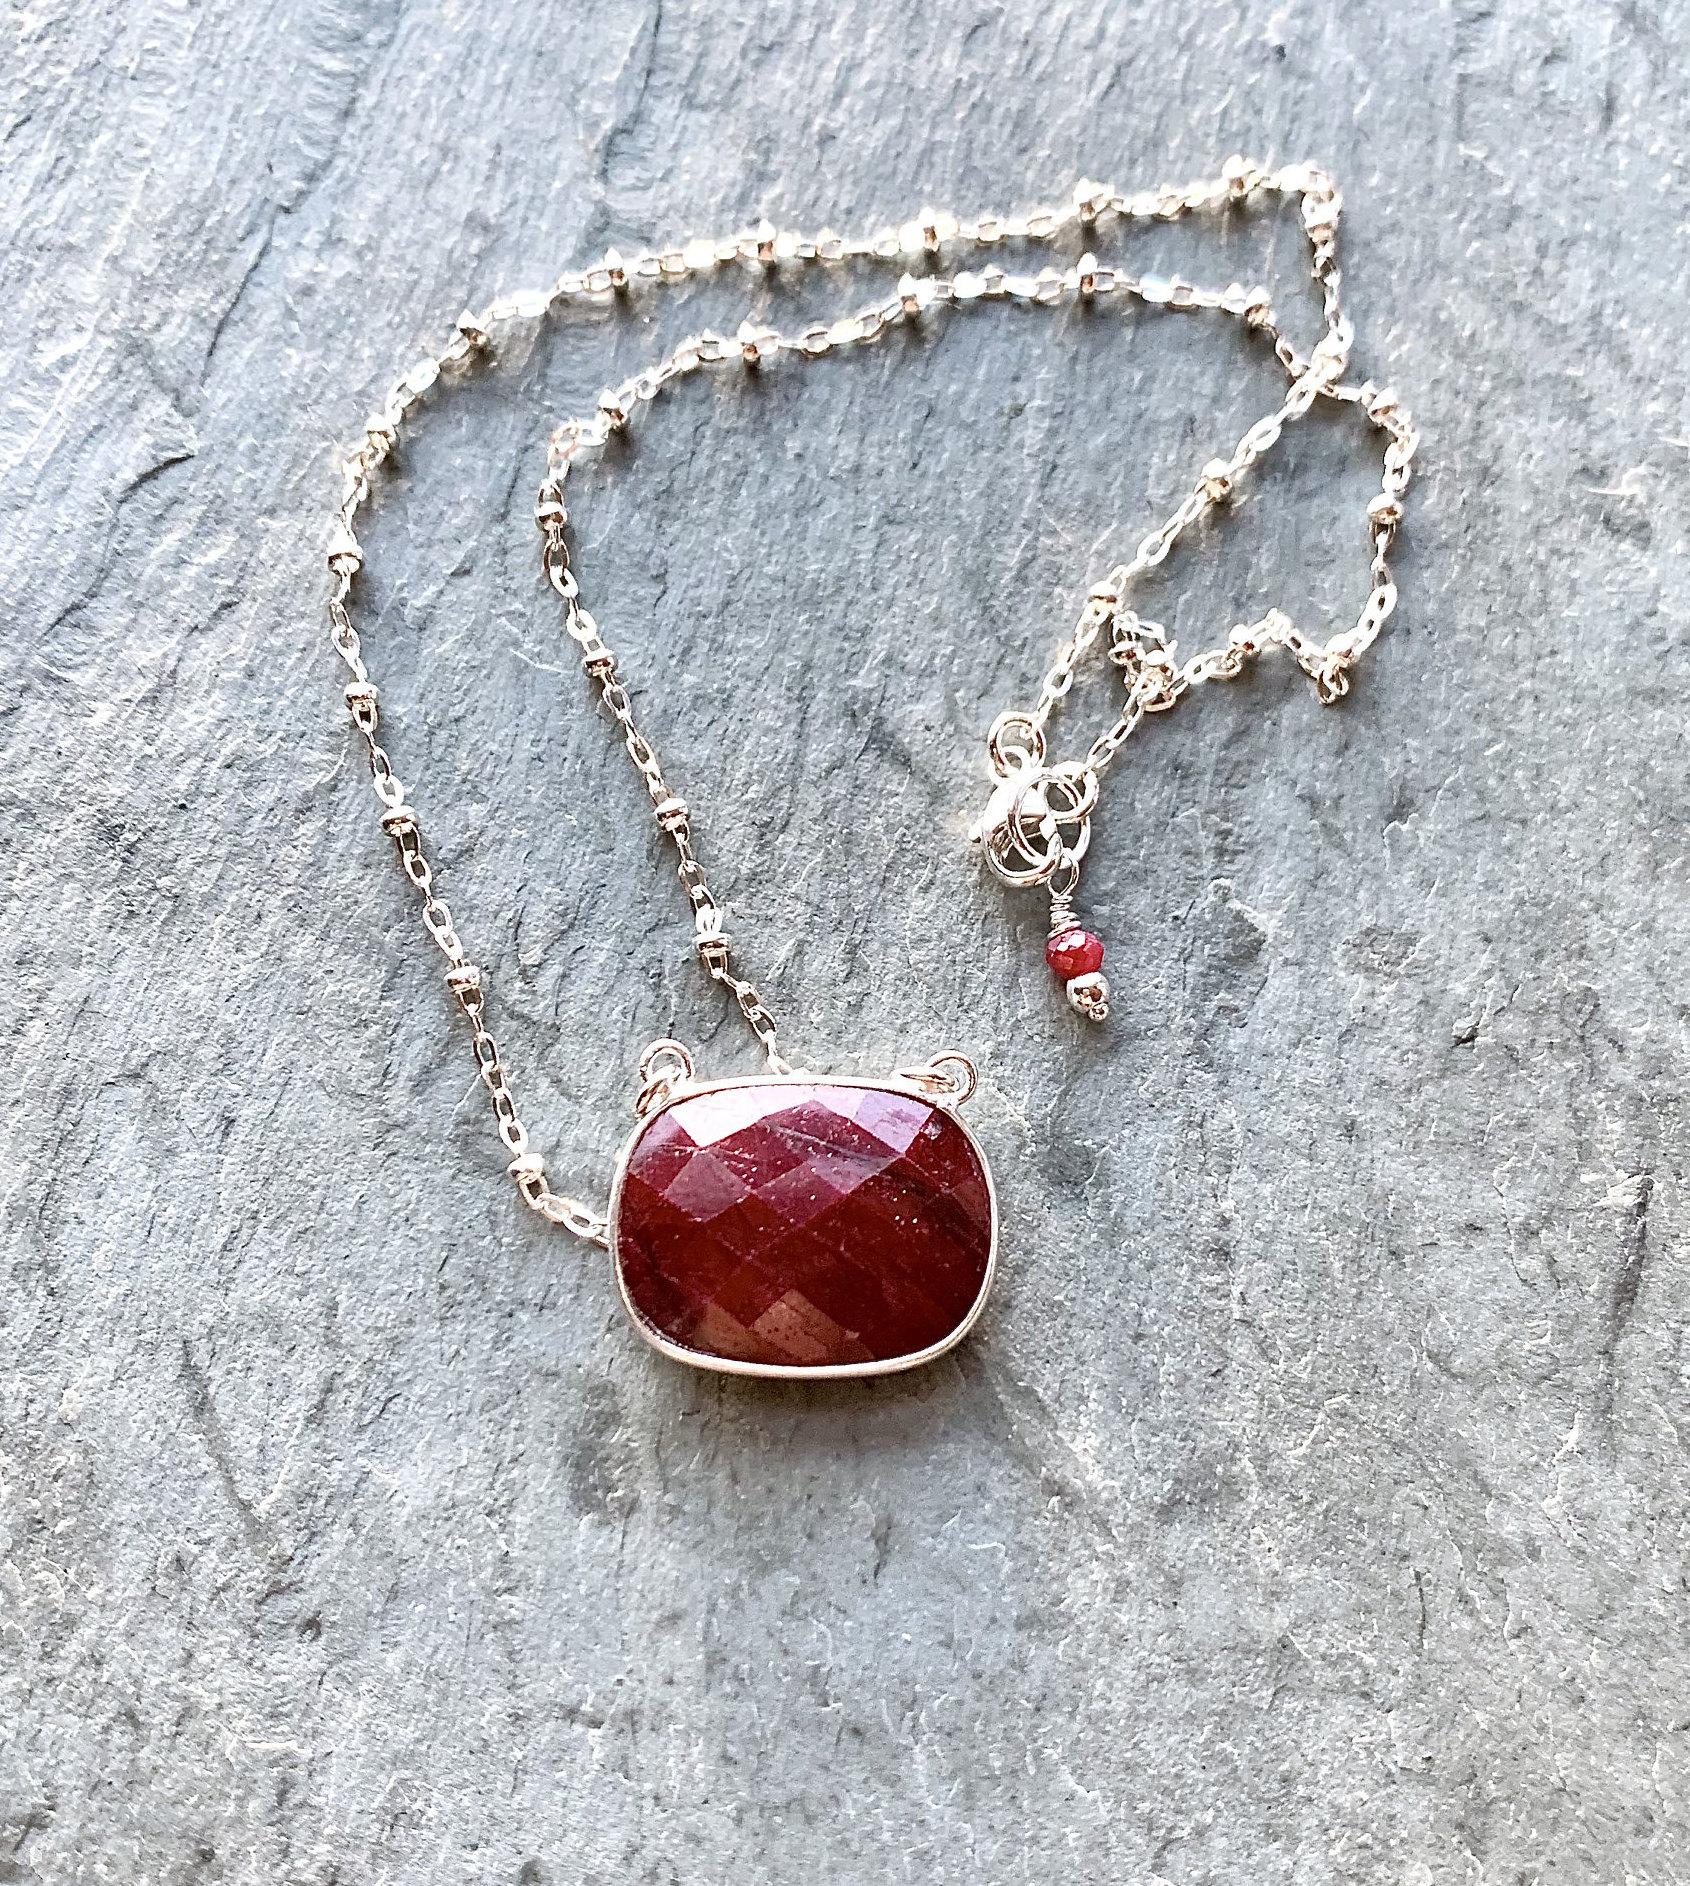 Dangle Earrings Mother Mary Jewelry Set Ruby Necklace Confirmation Jewelry Minimalist Beaded Jewelry Handmade Gift. Gemstone Jewelry